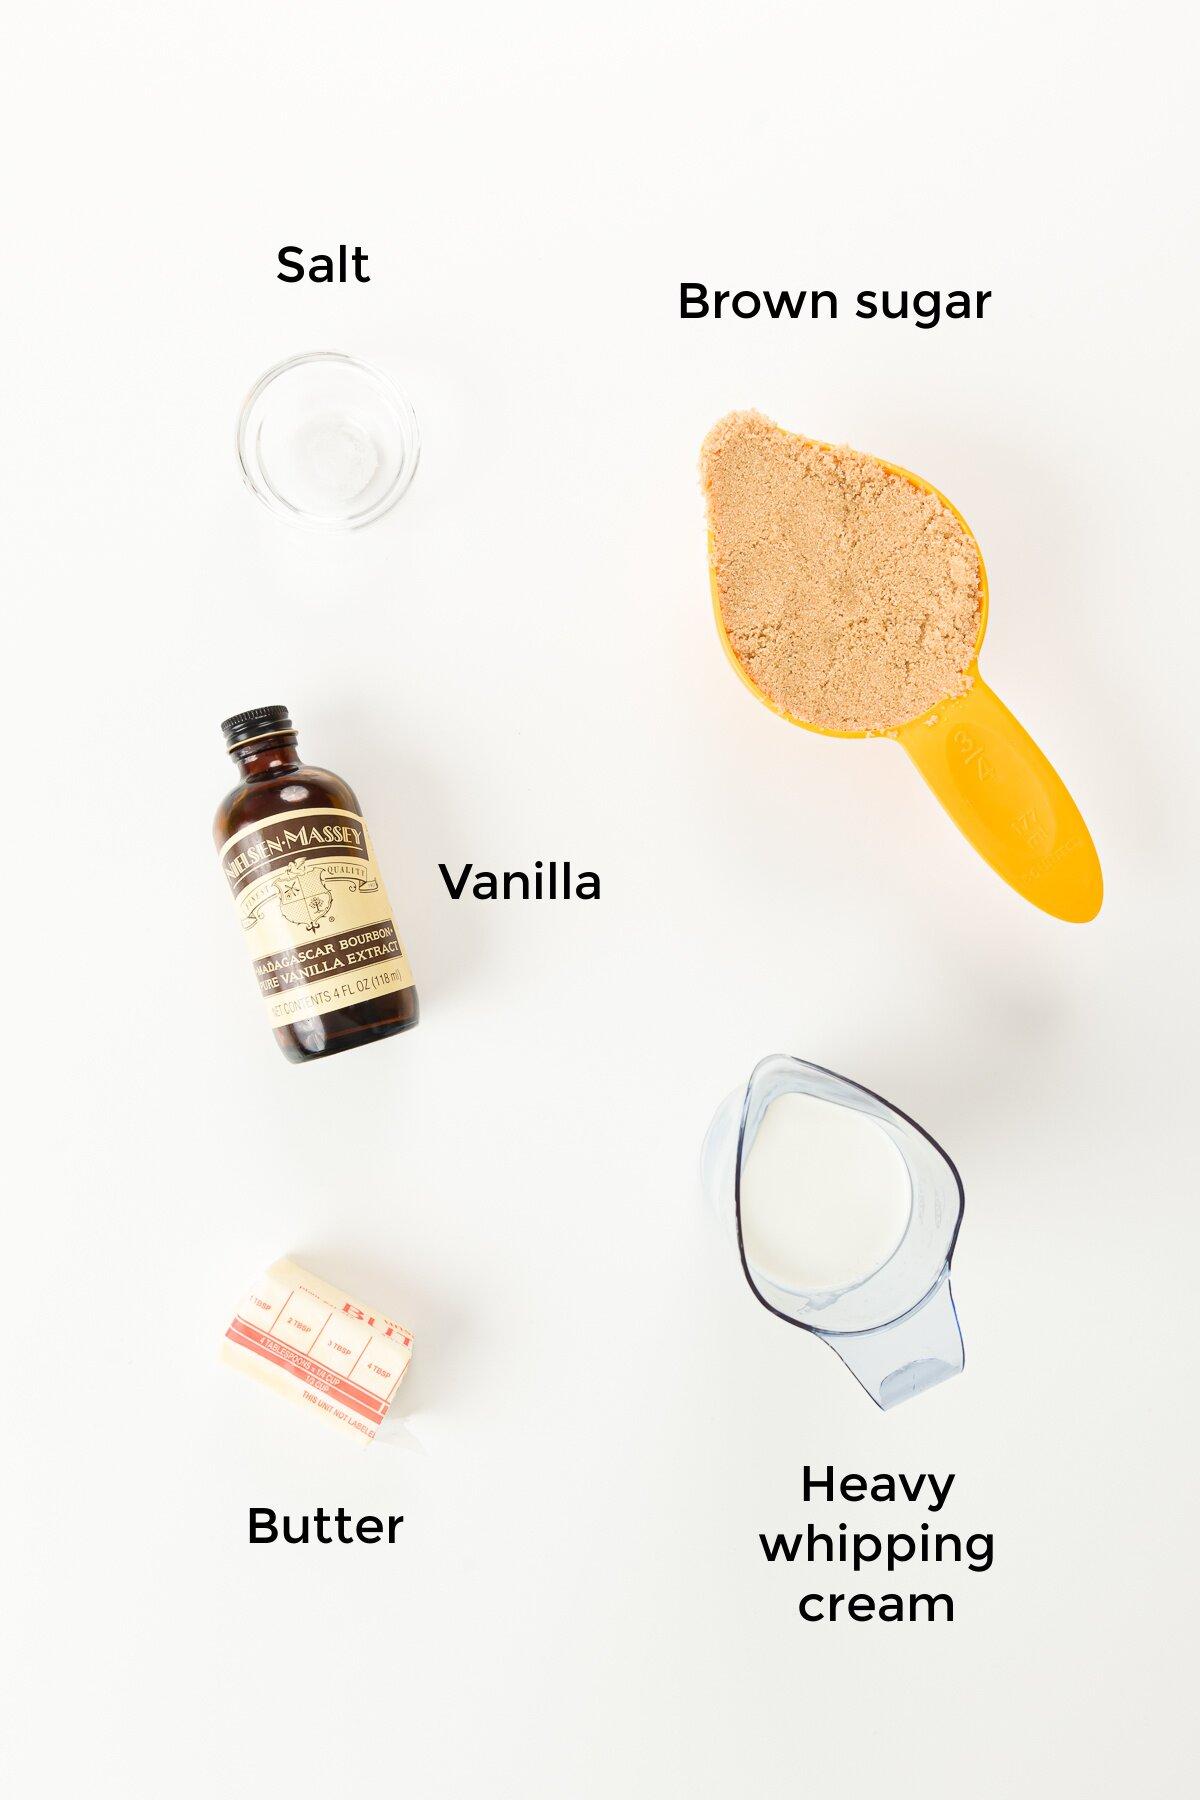 Butterscotch sauce ingredients